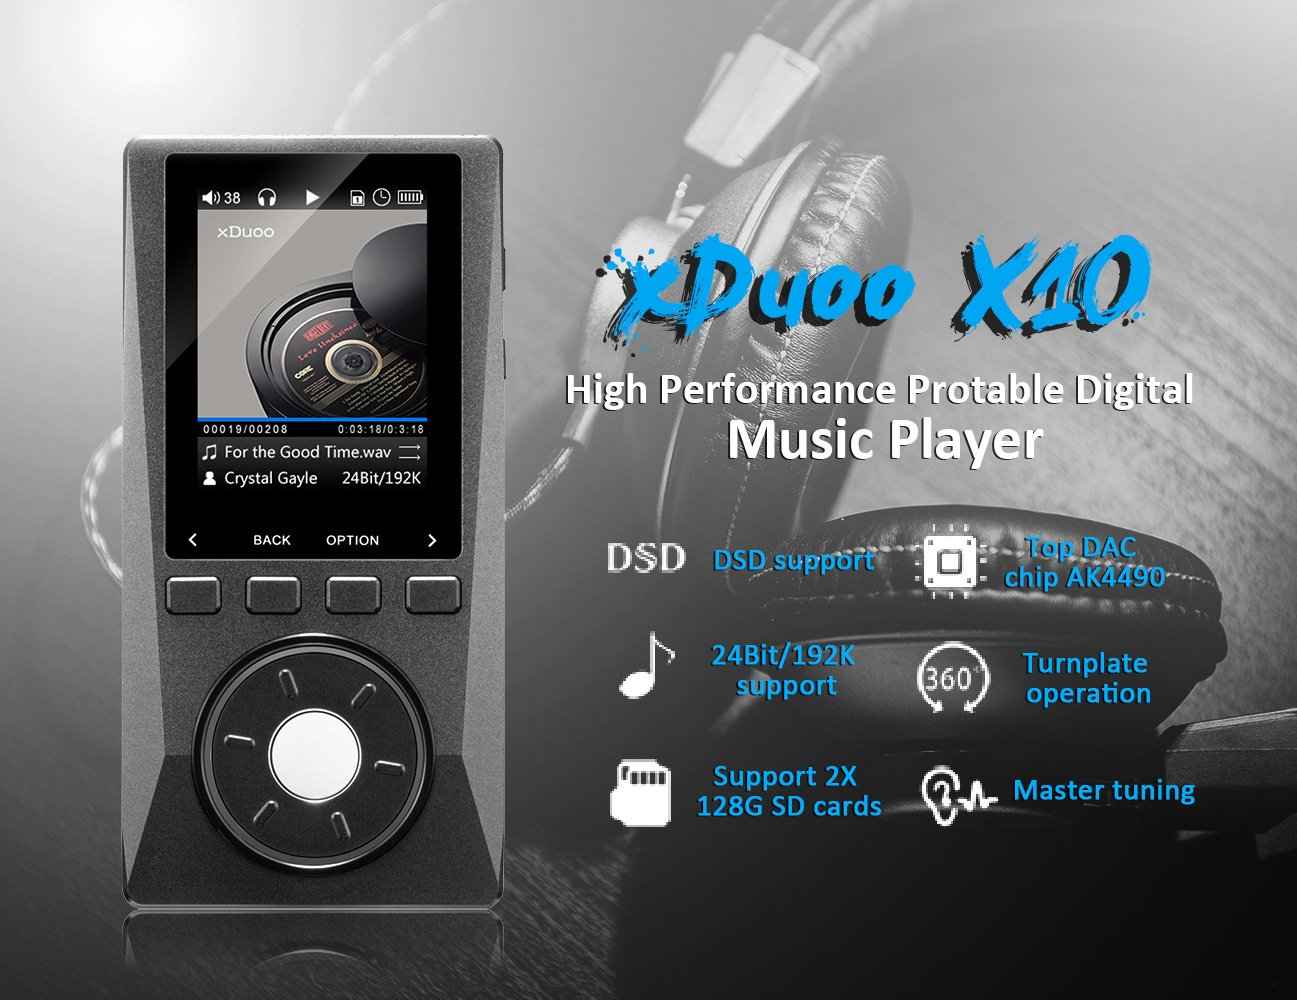 xduoo x10 hi fi loseless hd format ultra low distortion support xduoo x10 hi fi loseless hd format ultra low distortion support dsd 24bit 192k digital music mp3 player lightwish amazon ca electronics